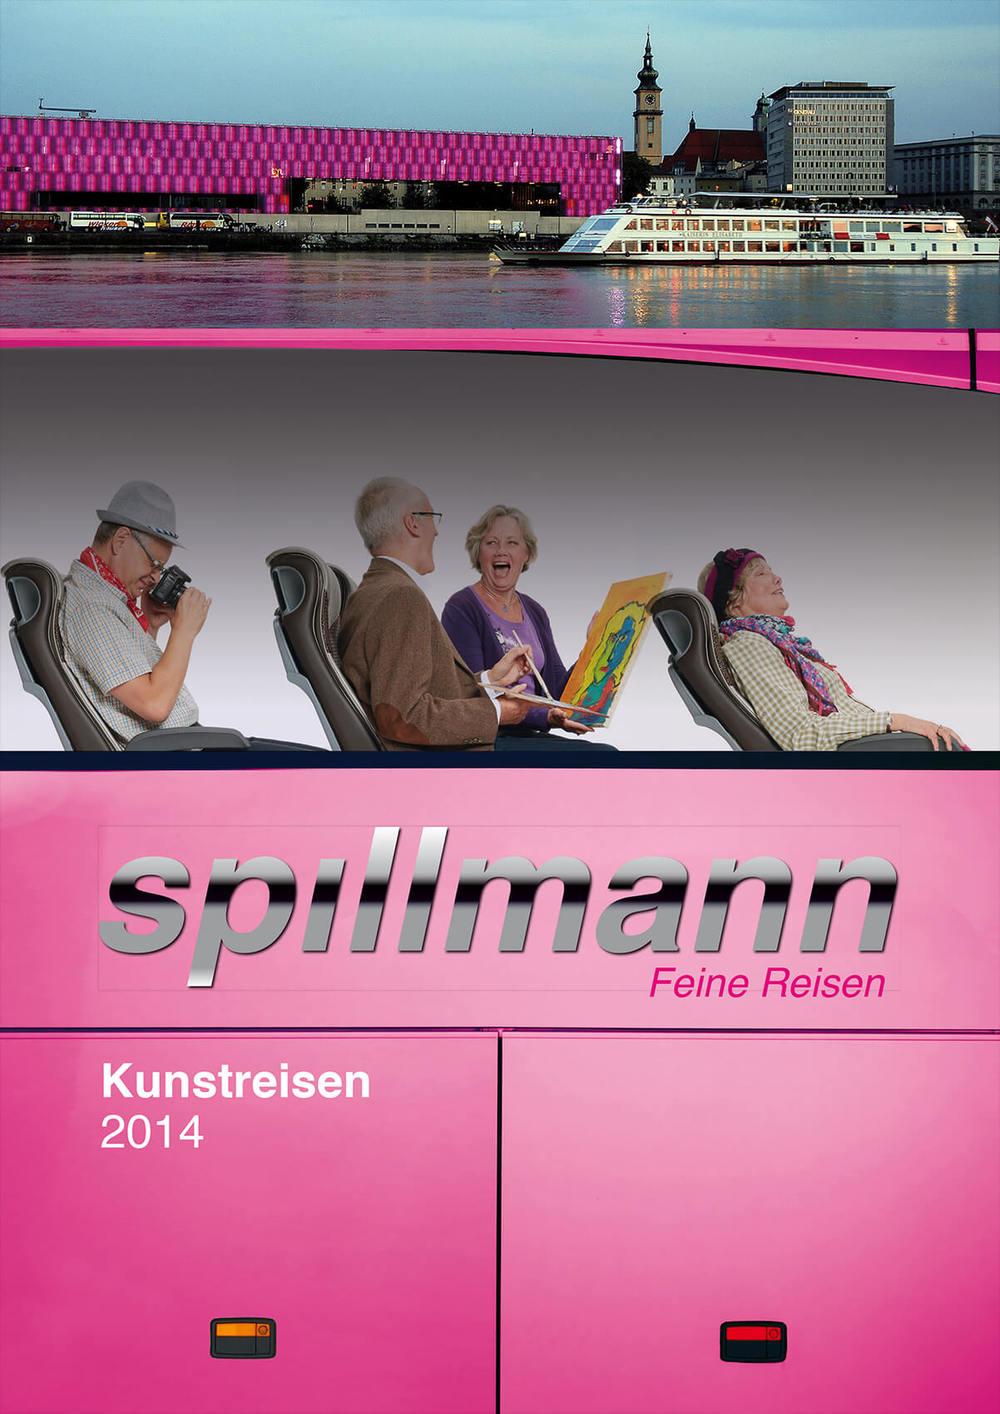 kunst-reisekatalog-spillmann-agentur-intermar-corporate.jpg